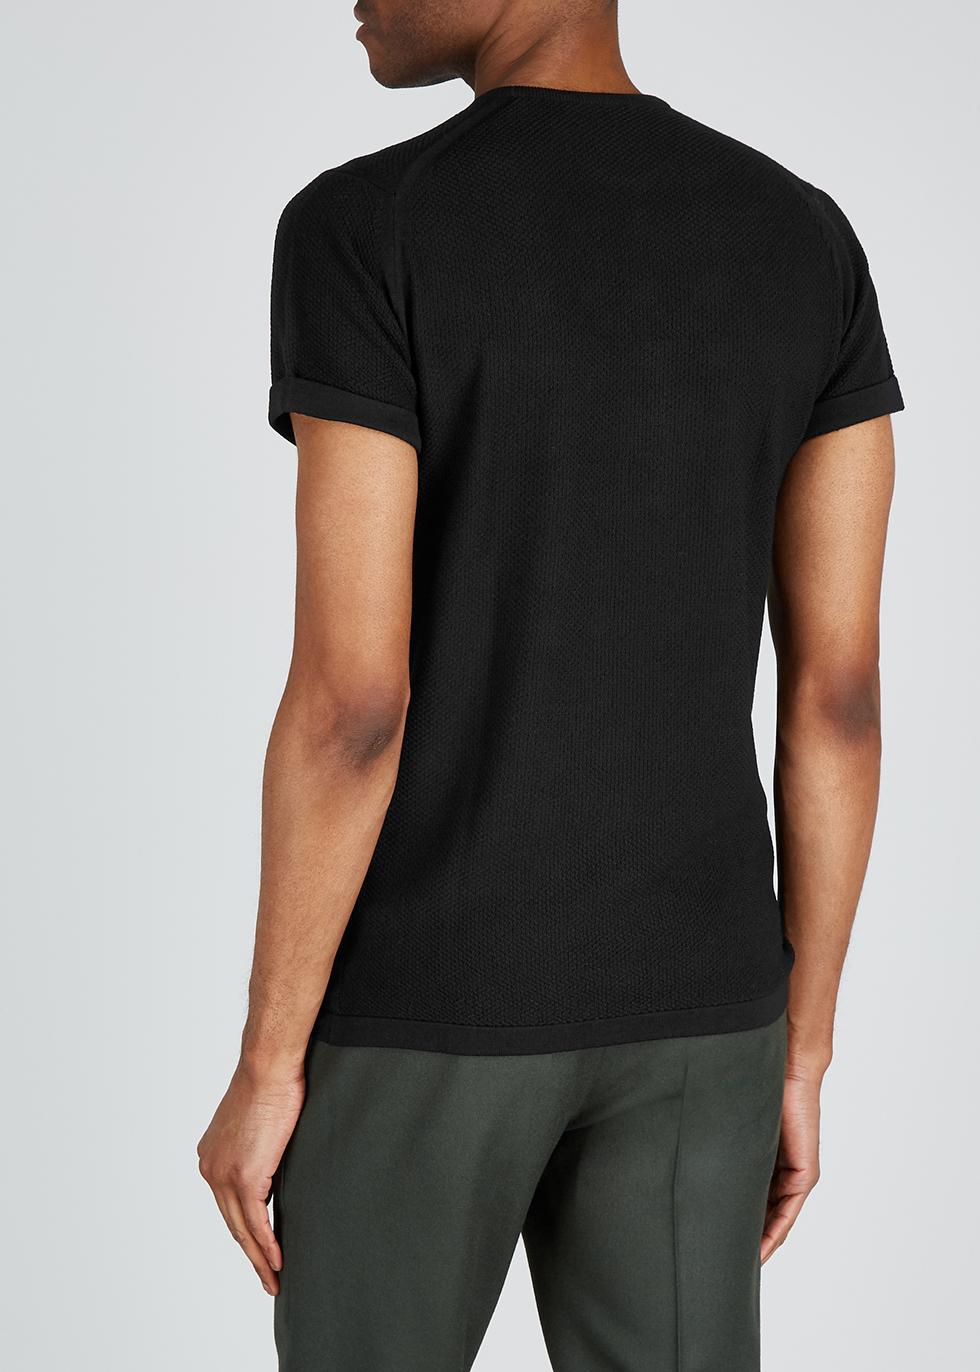 2. Singular black wool T-shirt - John Smedley